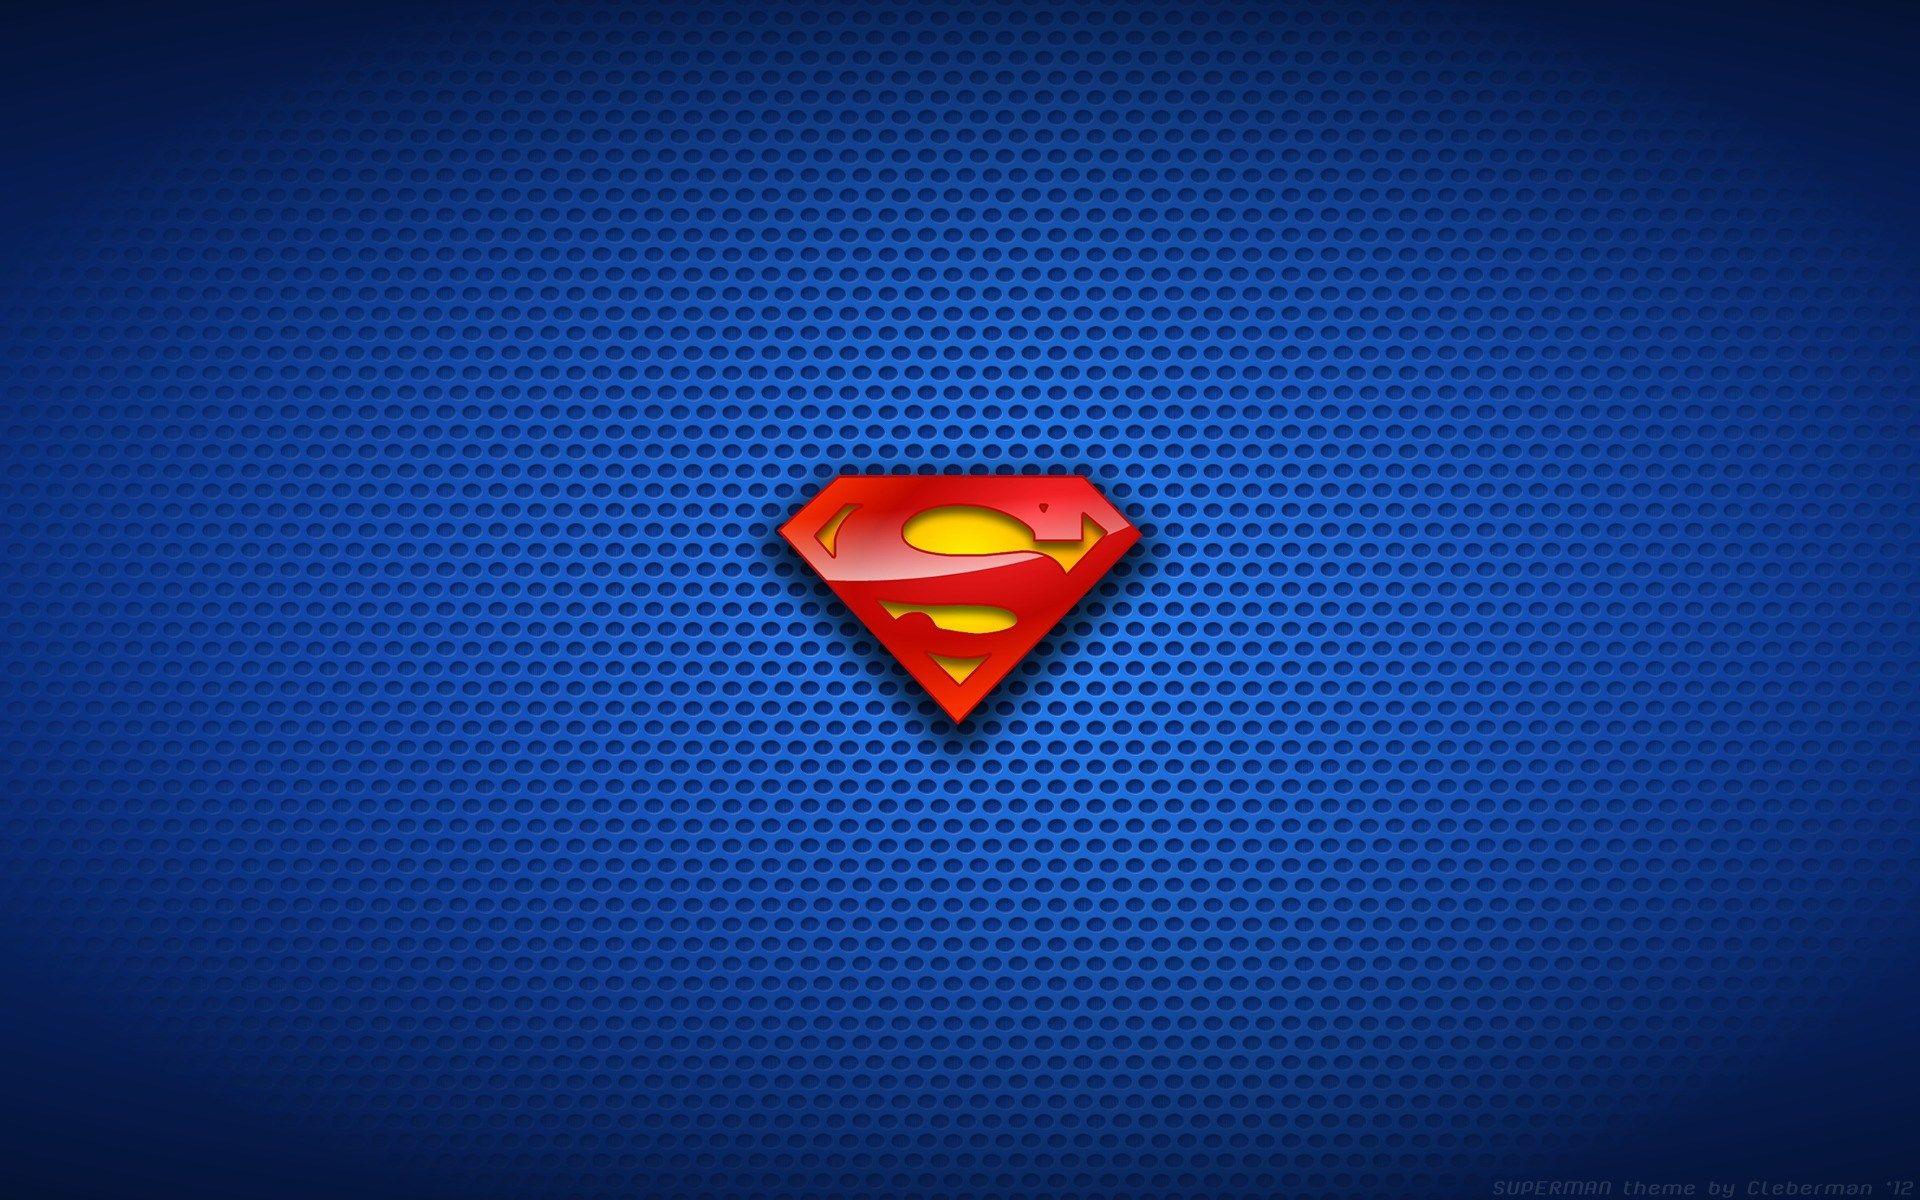 superman wallpaper free hd widescreen, 1920x1200 (474 kB